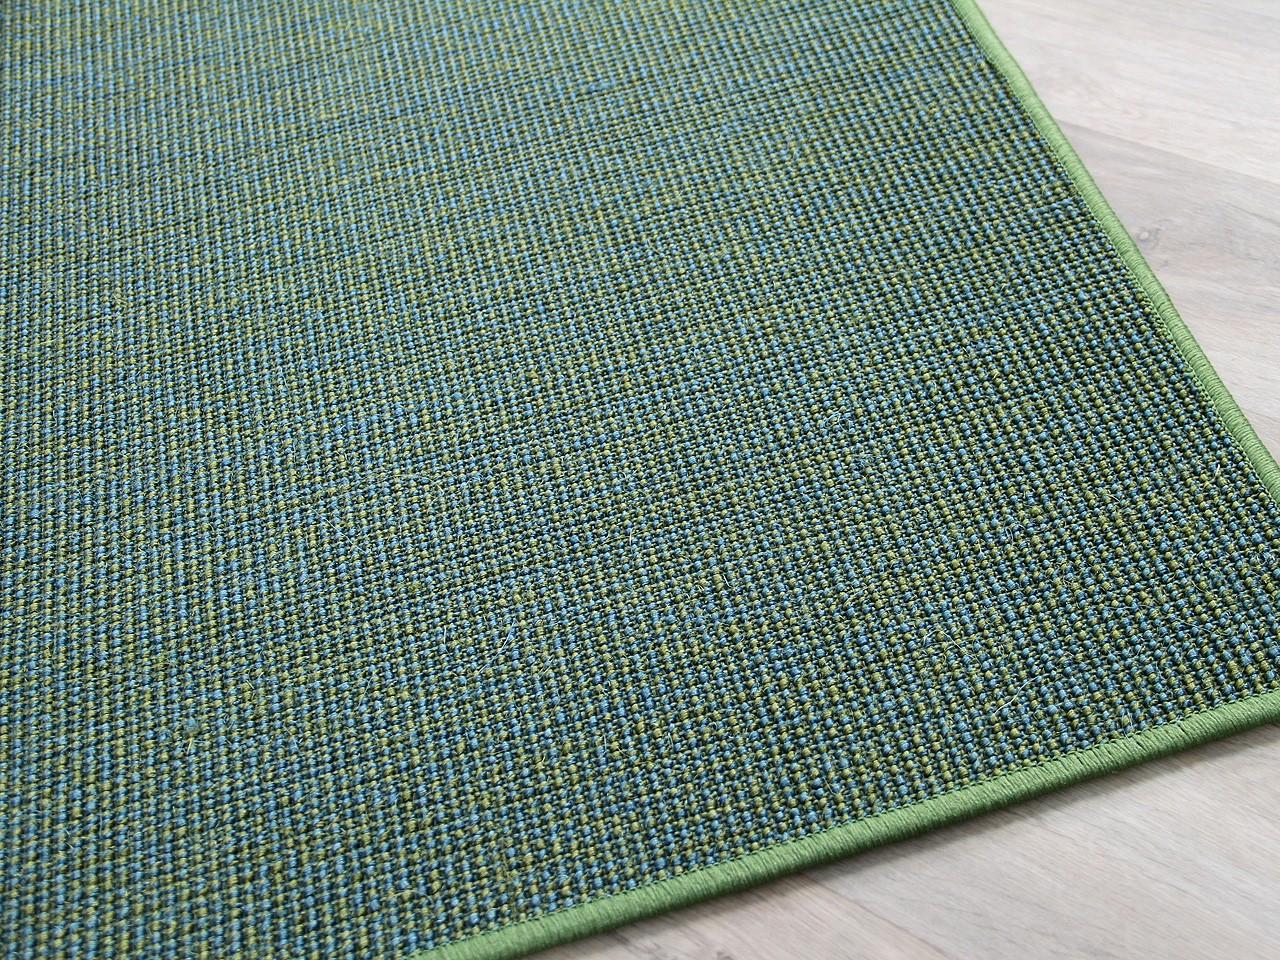 sisal natur teppich astra gr n blau mix in 24 gr en teppiche sisal und naturteppiche sisal. Black Bedroom Furniture Sets. Home Design Ideas